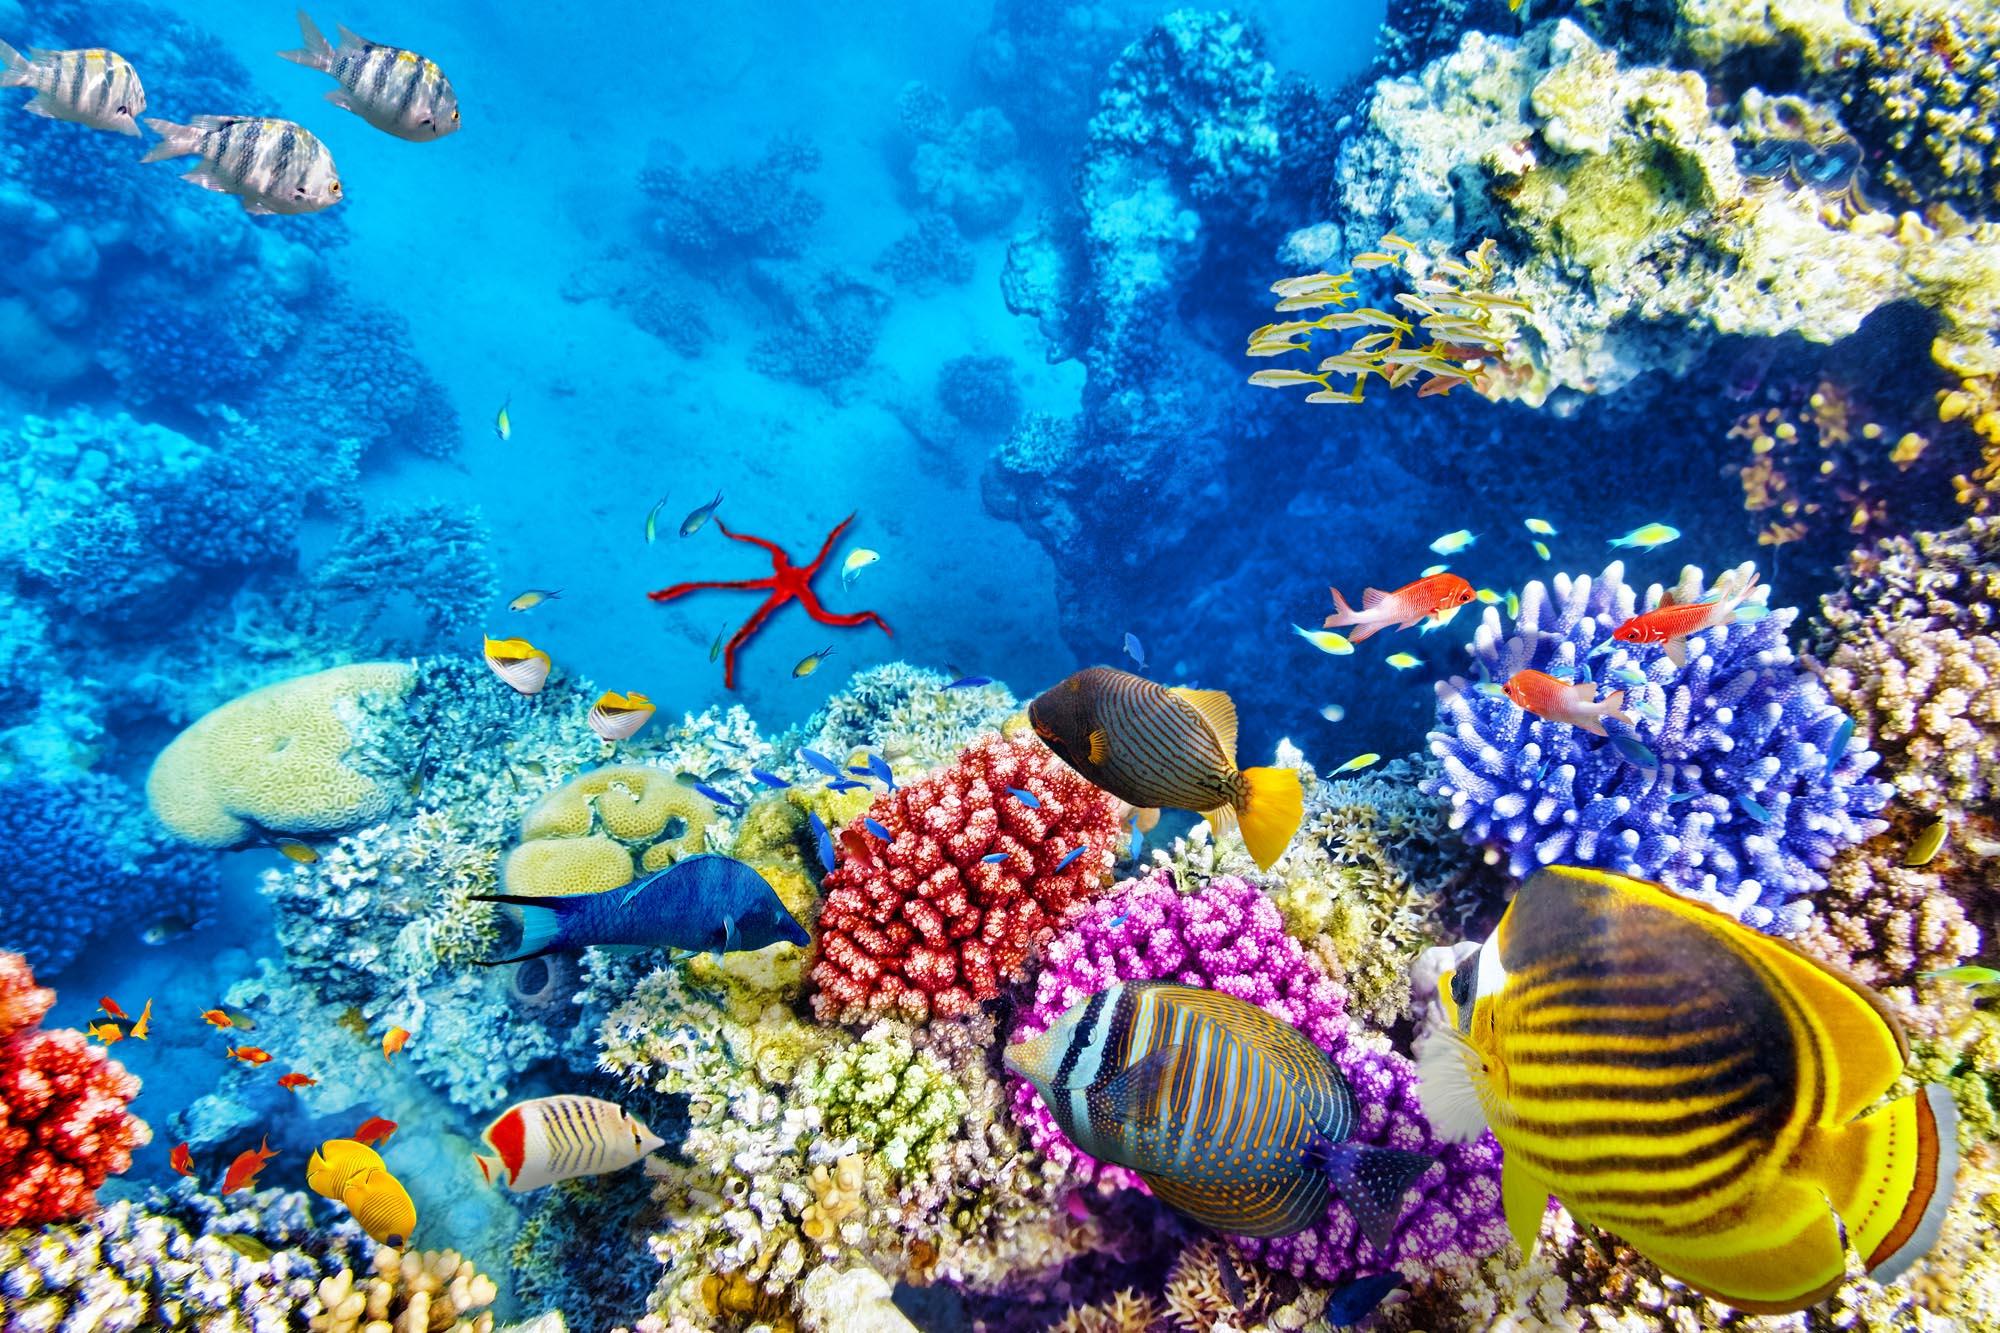 Underwater Life Red Sea Egypt